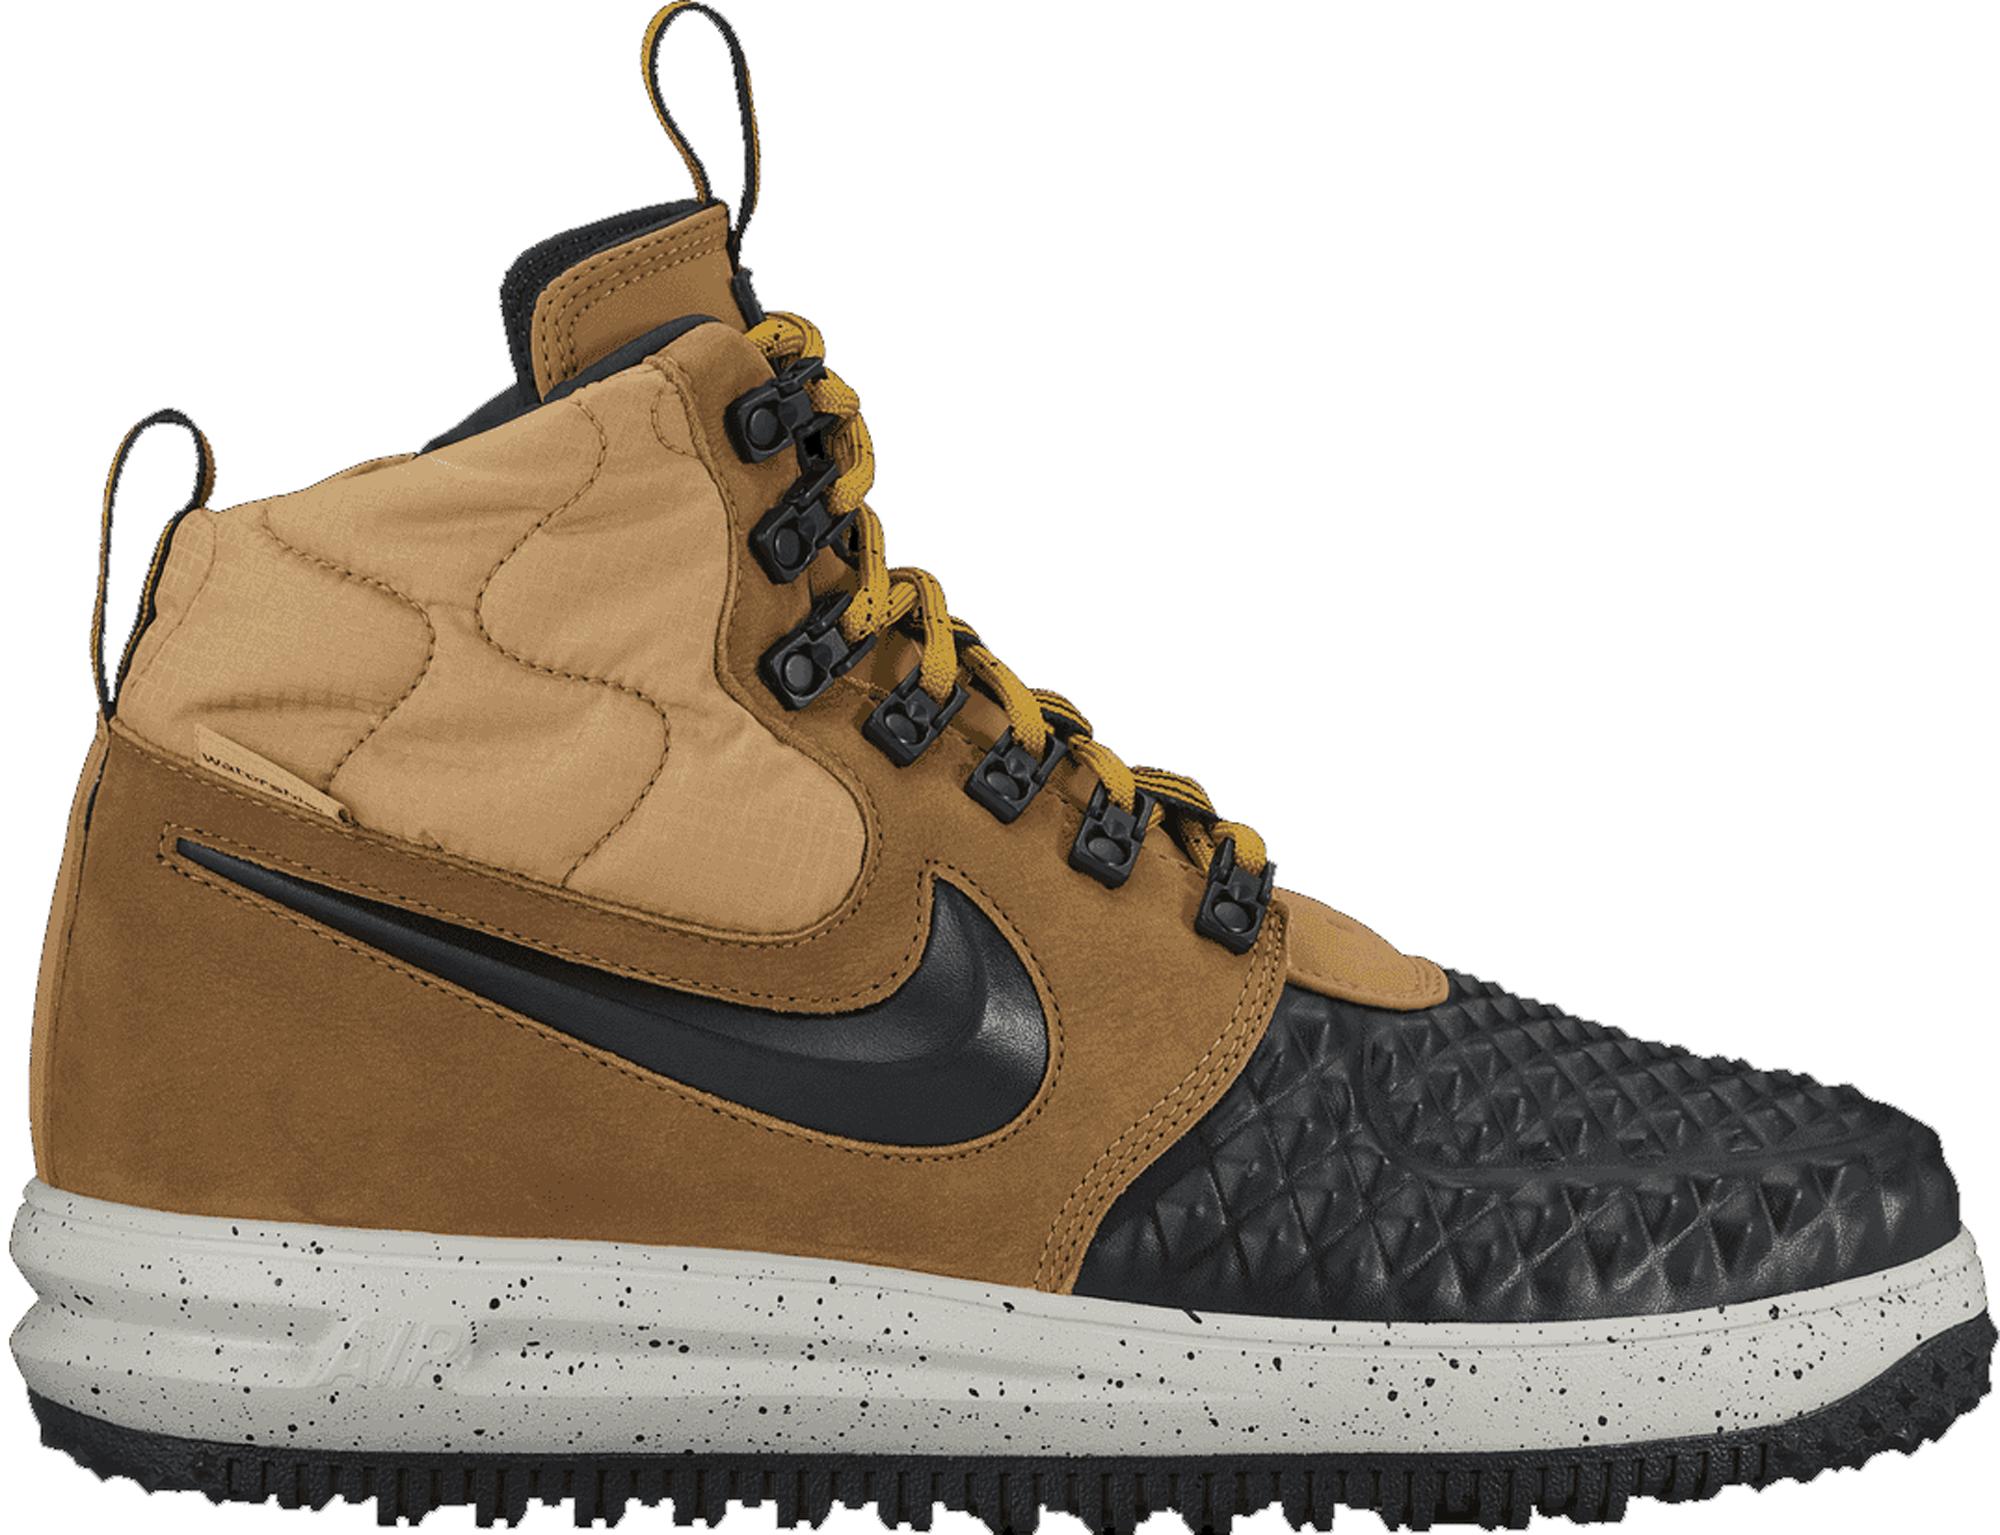 Nike Lunar Force 1 Duckboot Metallic Gold